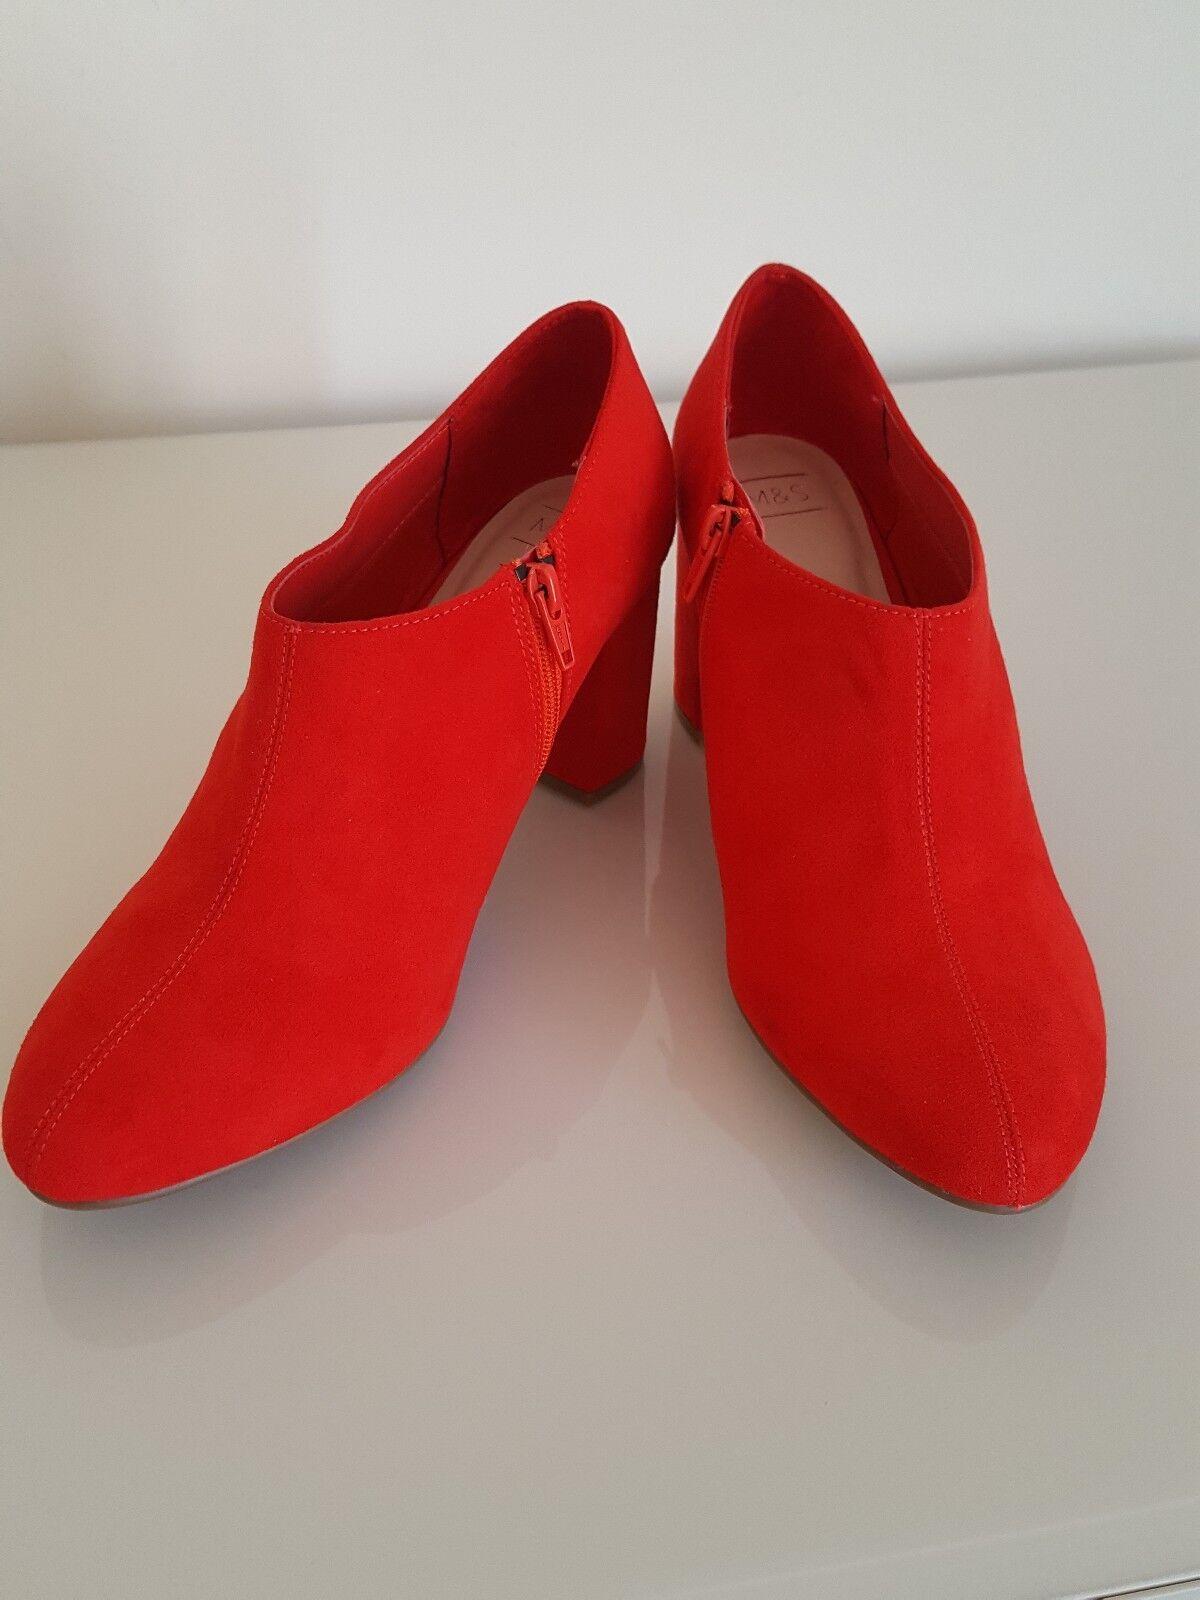 M & S THE EVERYWEAR SHOE BOOT Block Heel Side Zip shoes Boots